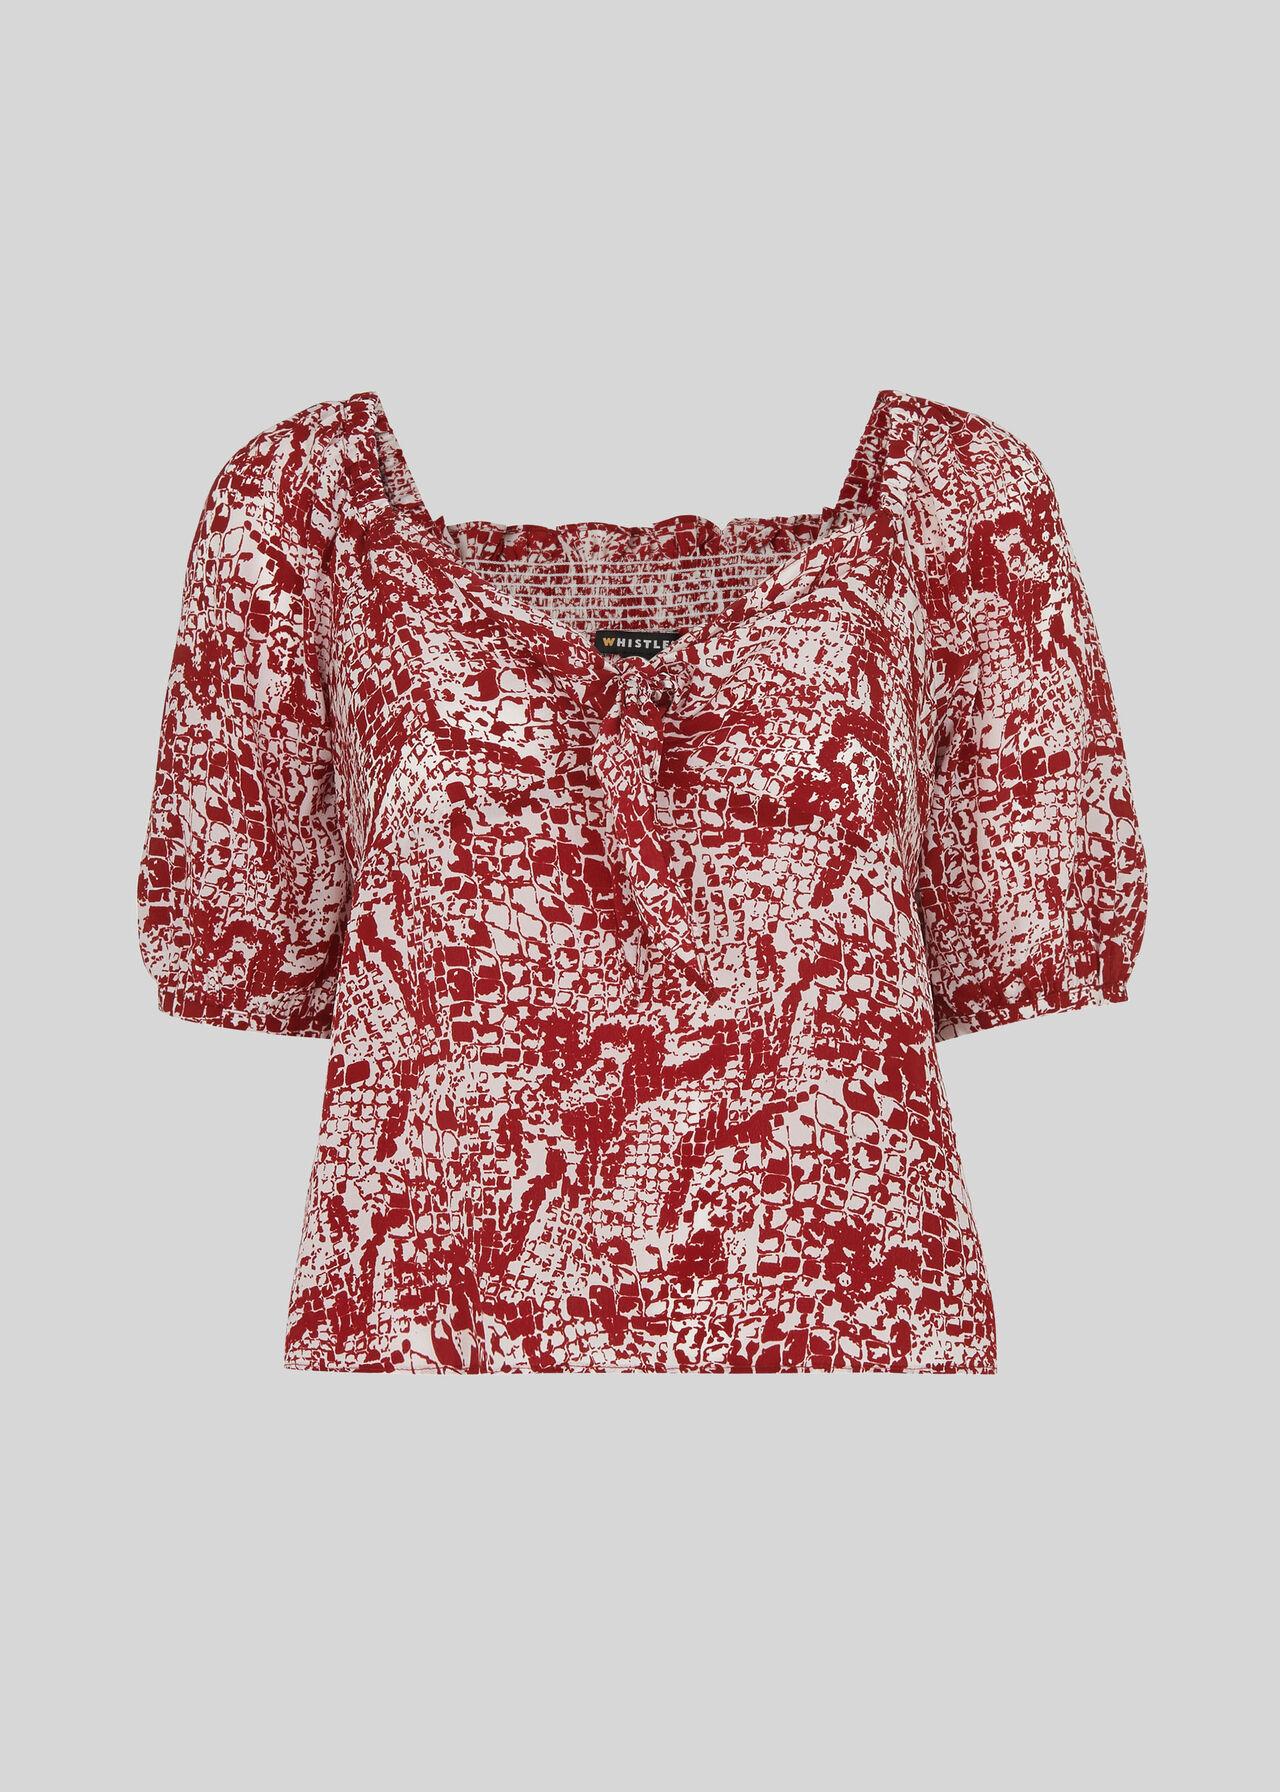 Snake Print Silk Top Red/Multi